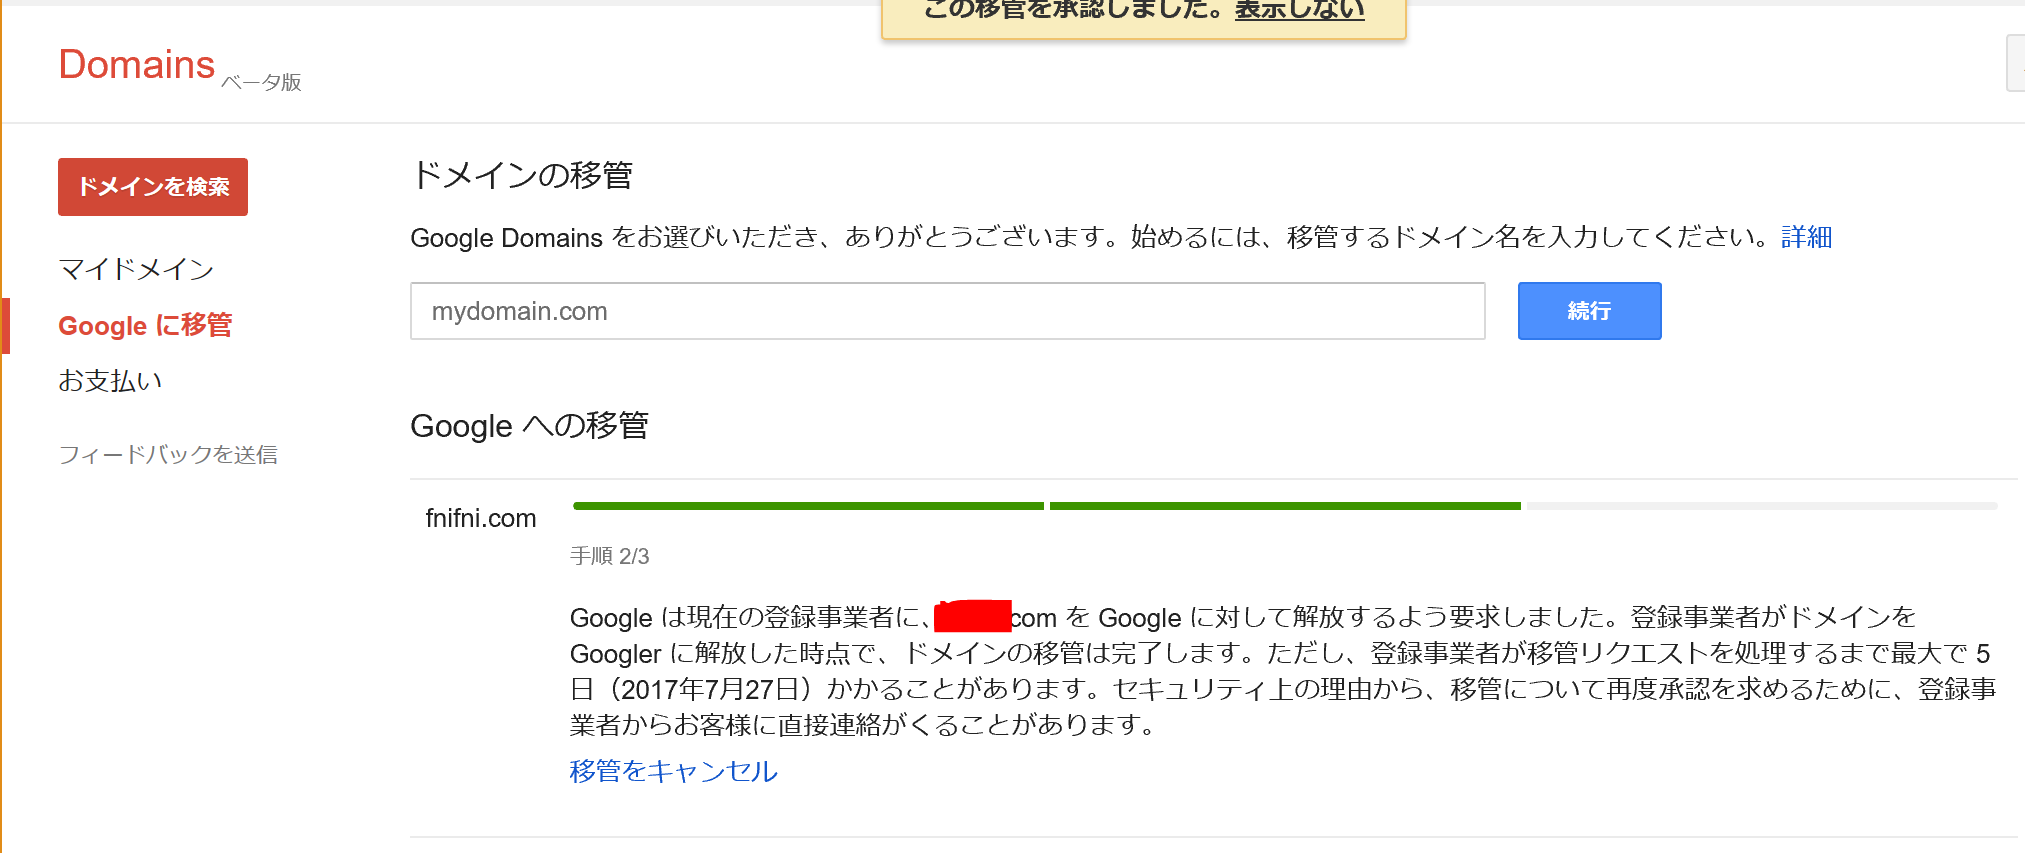 domains12.PNG